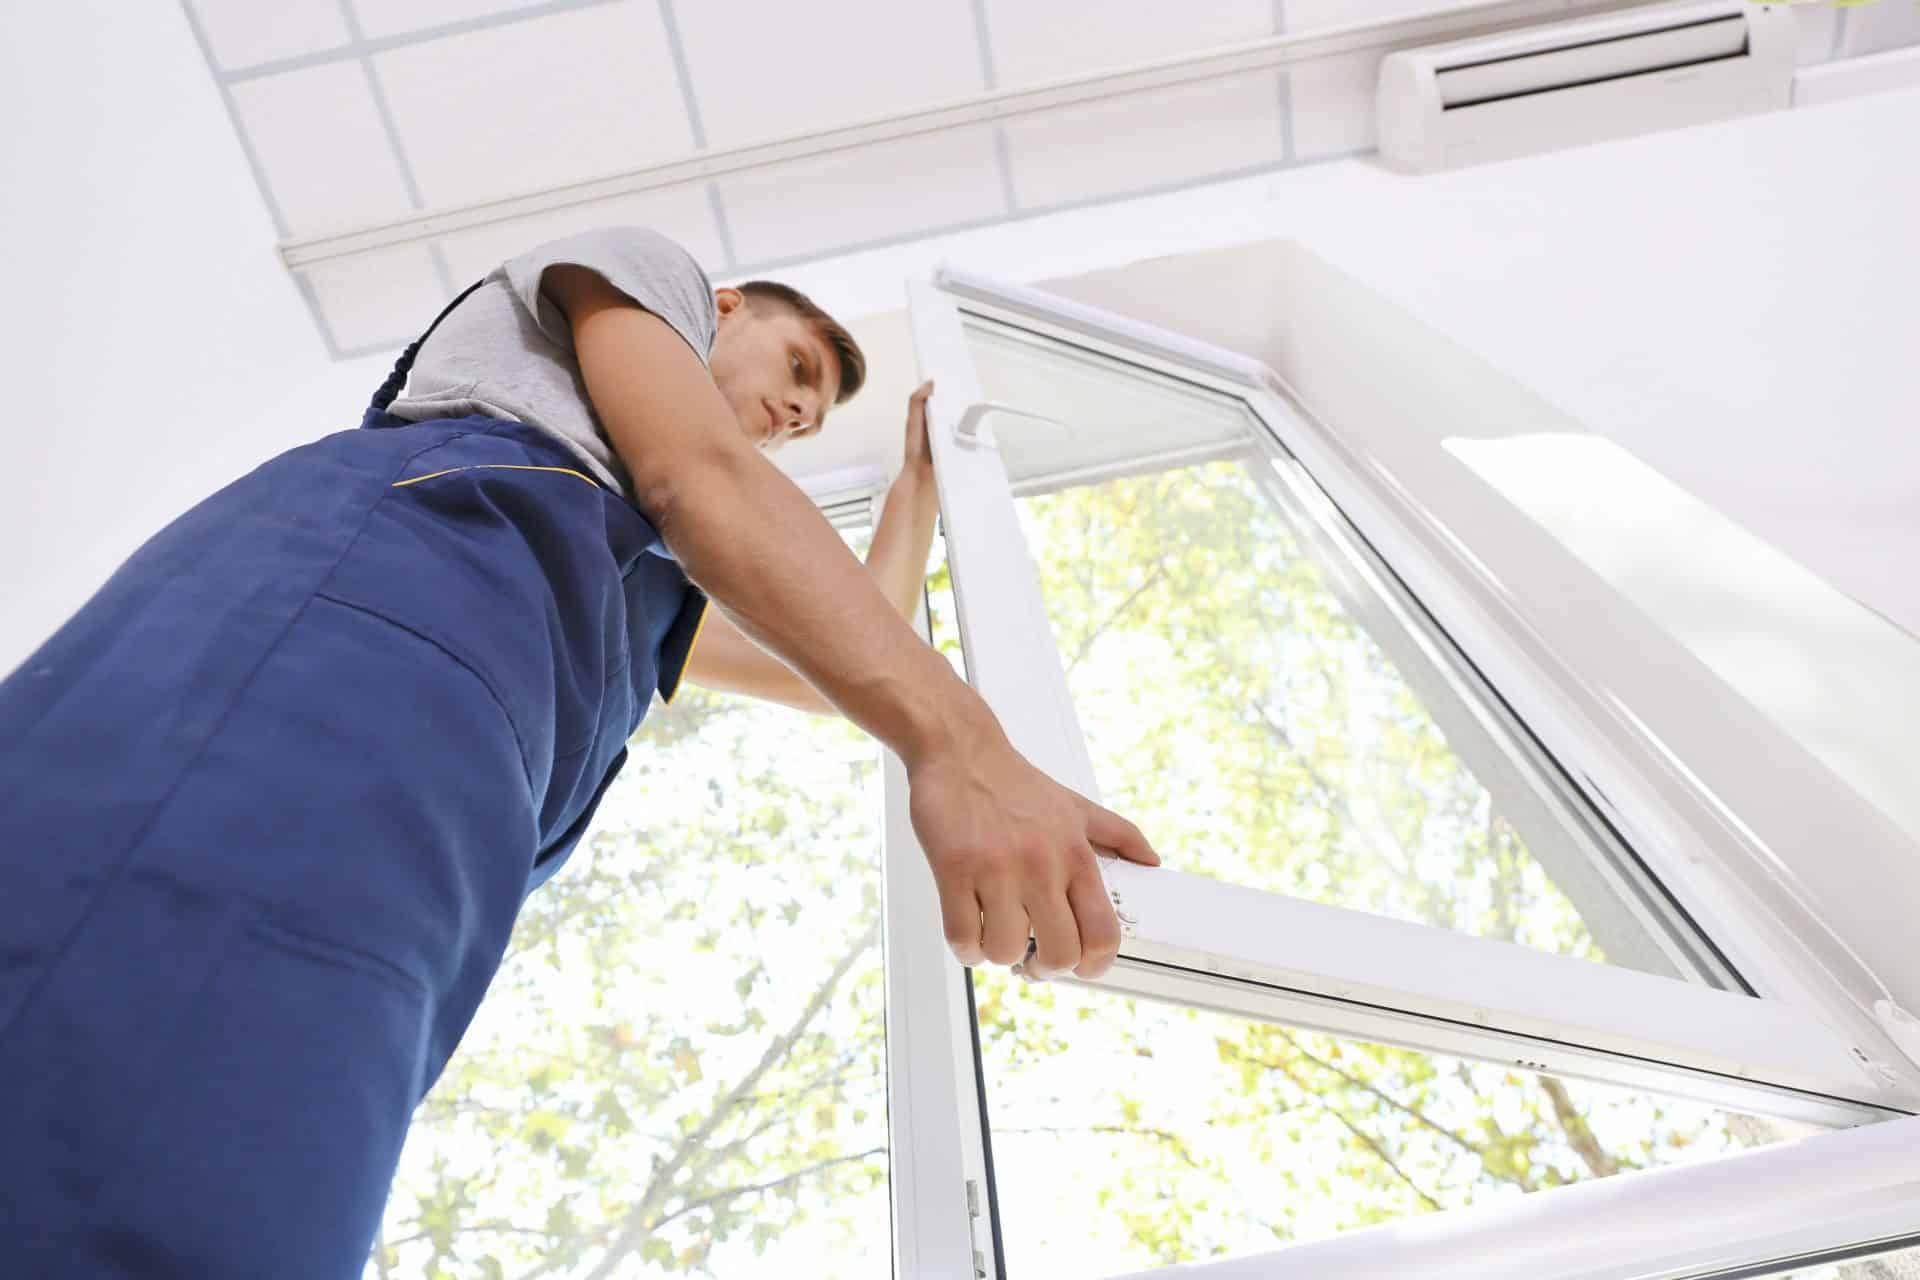 Installer une fenêtre